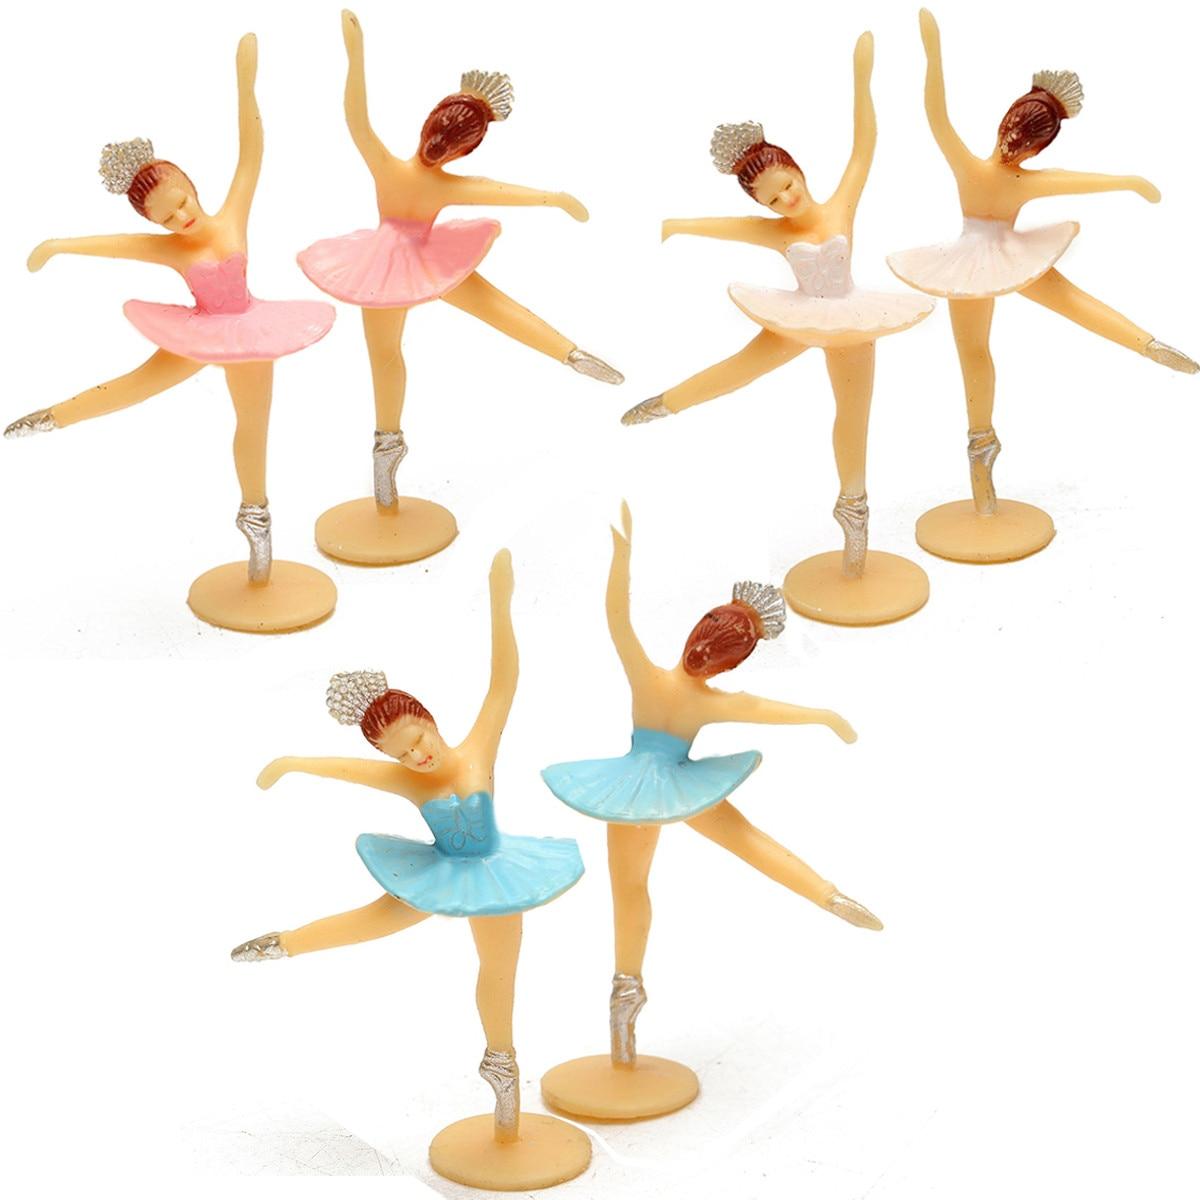 12 Pcs/set Mini Dancing Girl Favor Baby Shower Gift Kids Birthday Decor Model Toys For Children Adult Kids Accessories фигурки за торта балерина